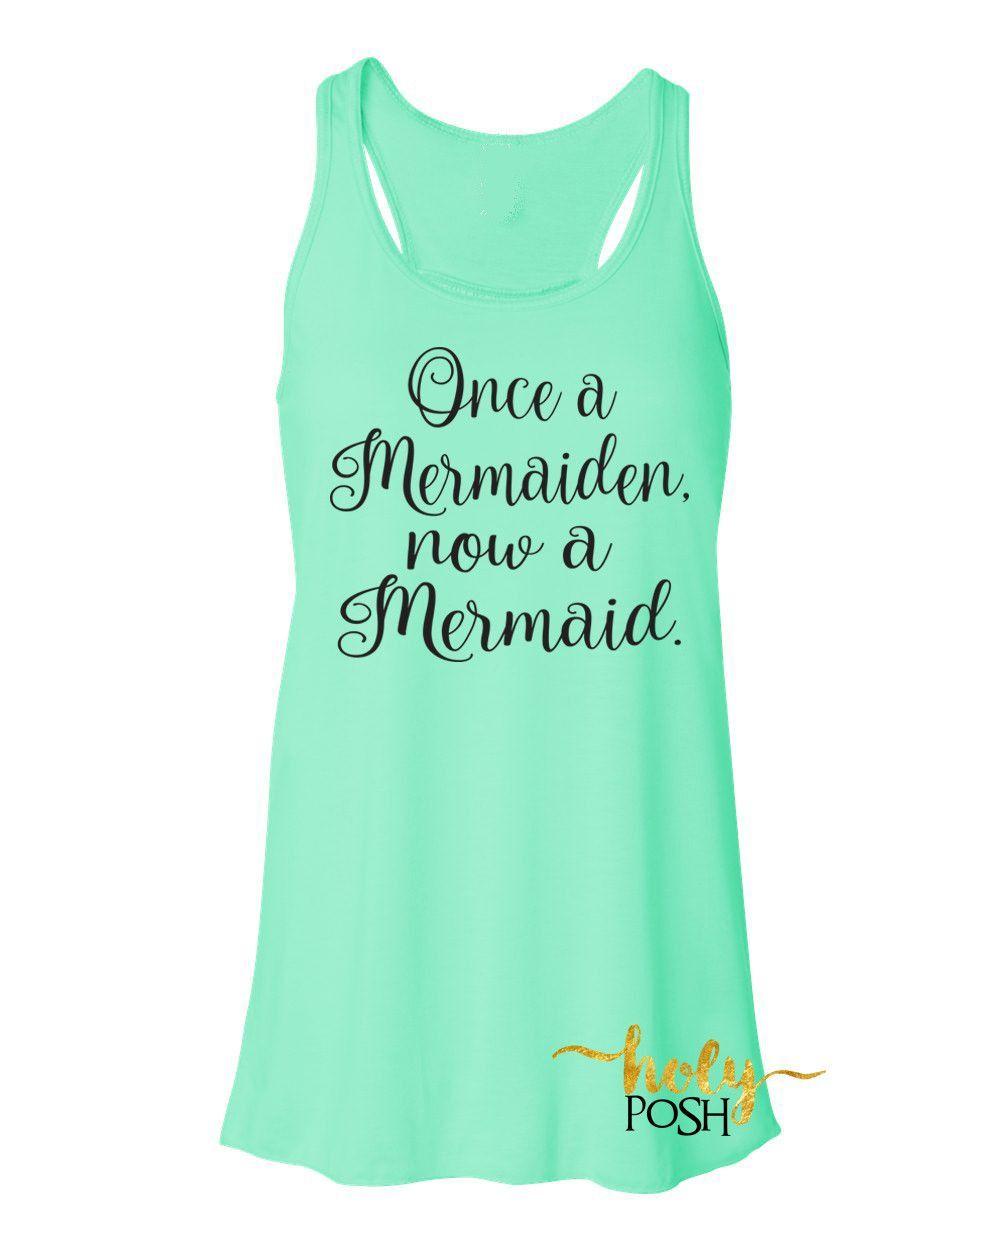 446c087e1f39 Once a Mermaiden Now a Mermaid Bride Tank Top- Bride Shirt- Bride Gift-  Mermaid…